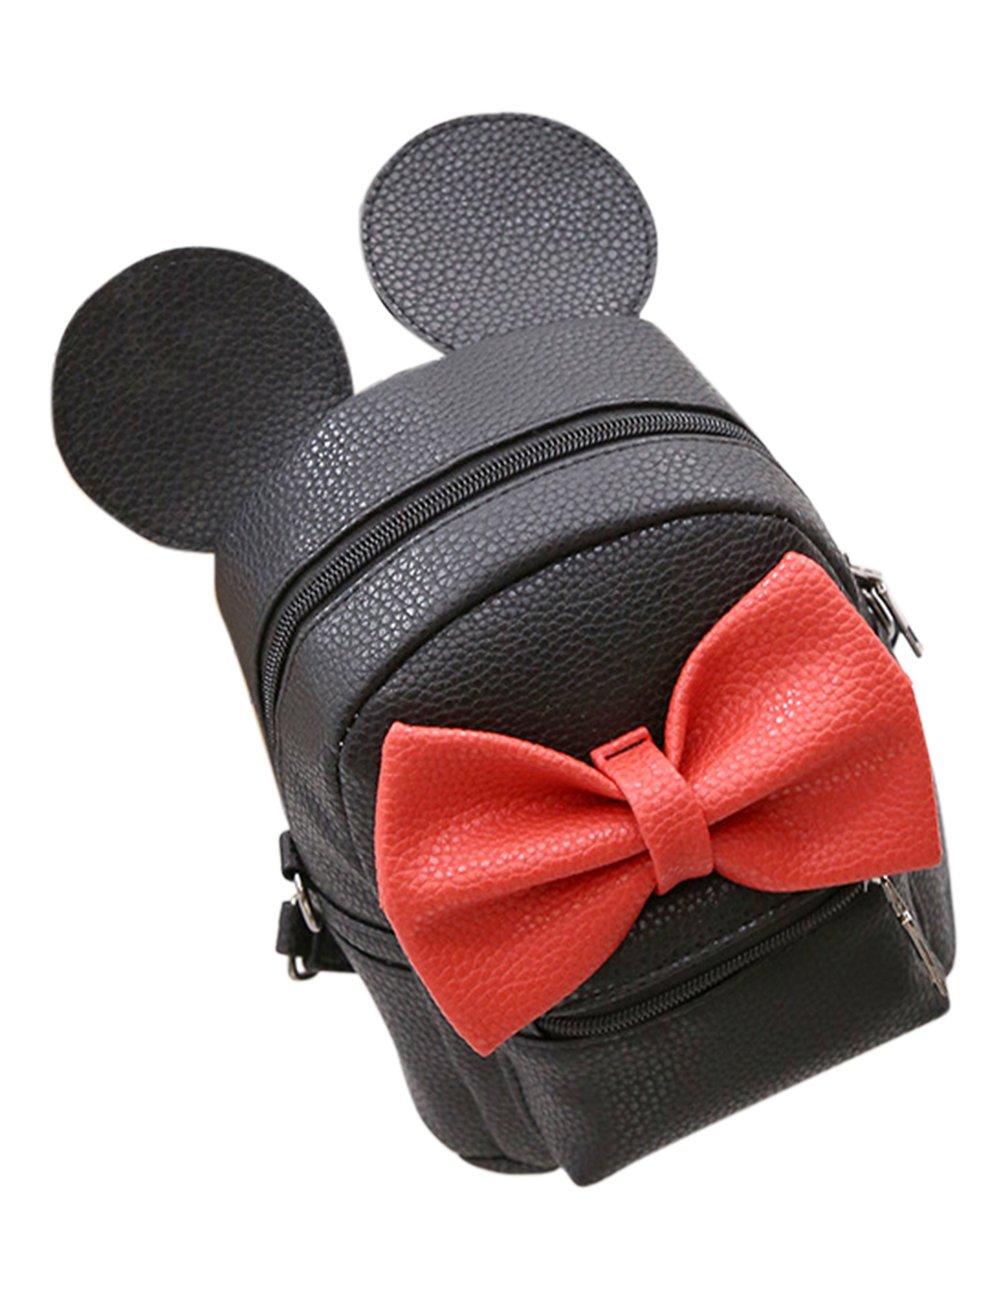 ShiningLove Women's PU Leather Cute Bowknot Ears Backpack Shoulder Multipurpose Span Bag